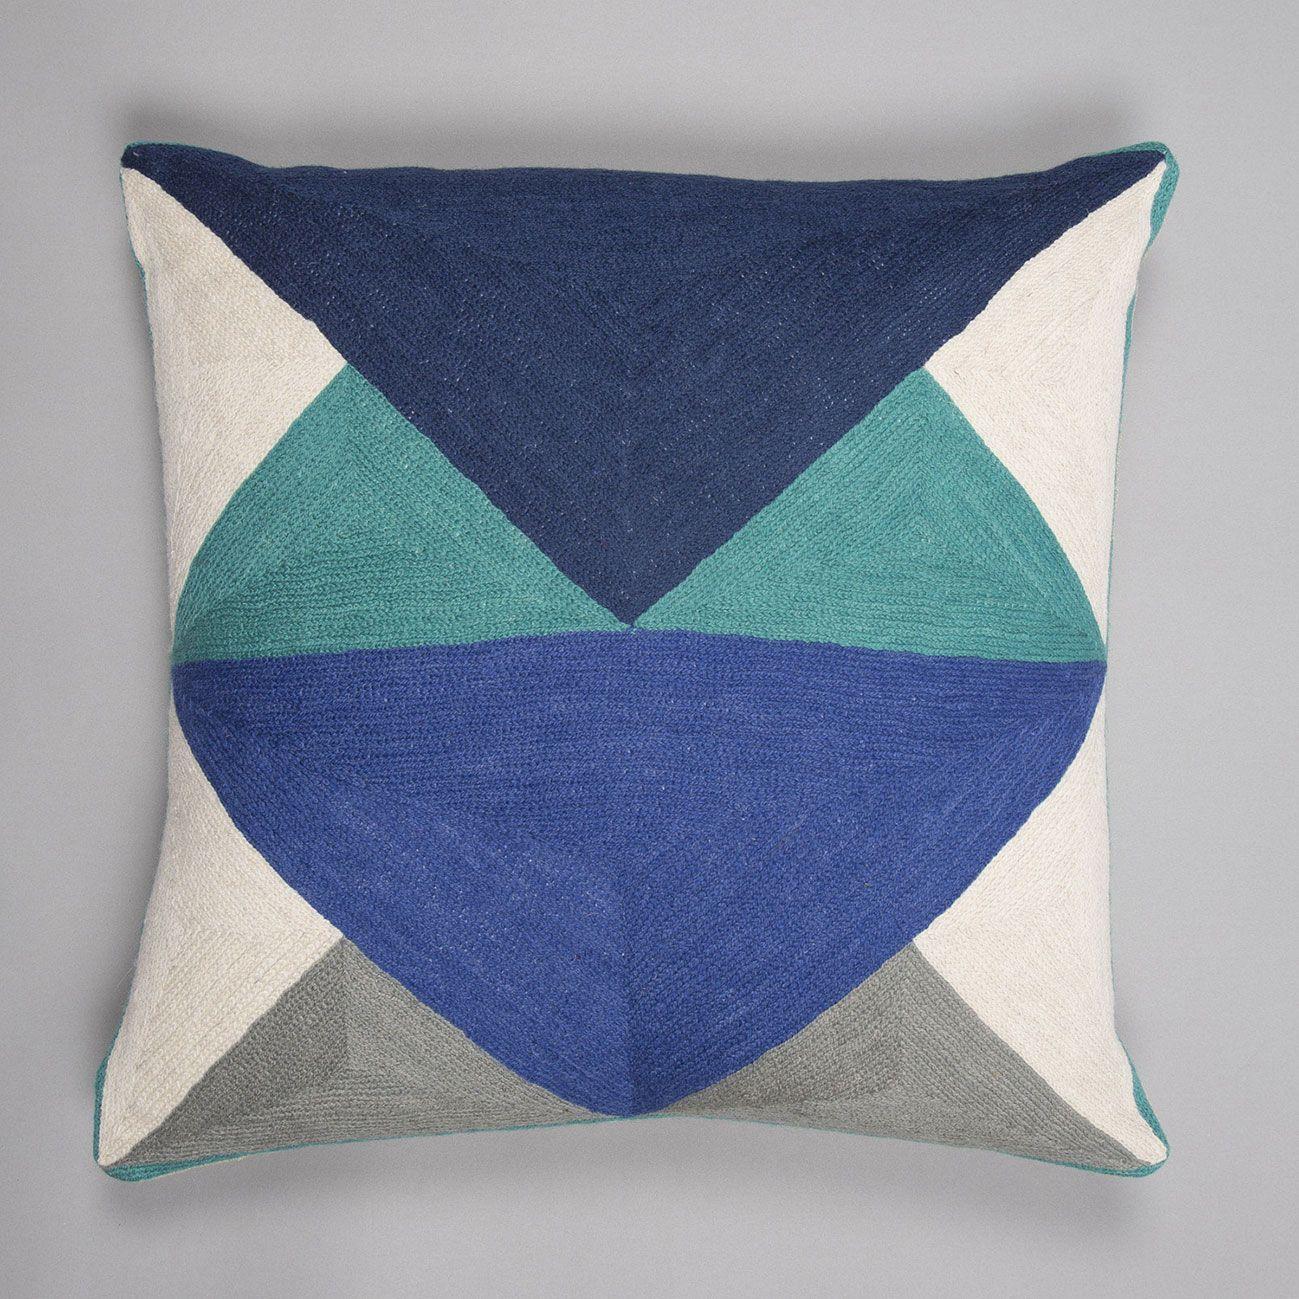 Lewitt cushion cover image tamarisk way pinterest designer